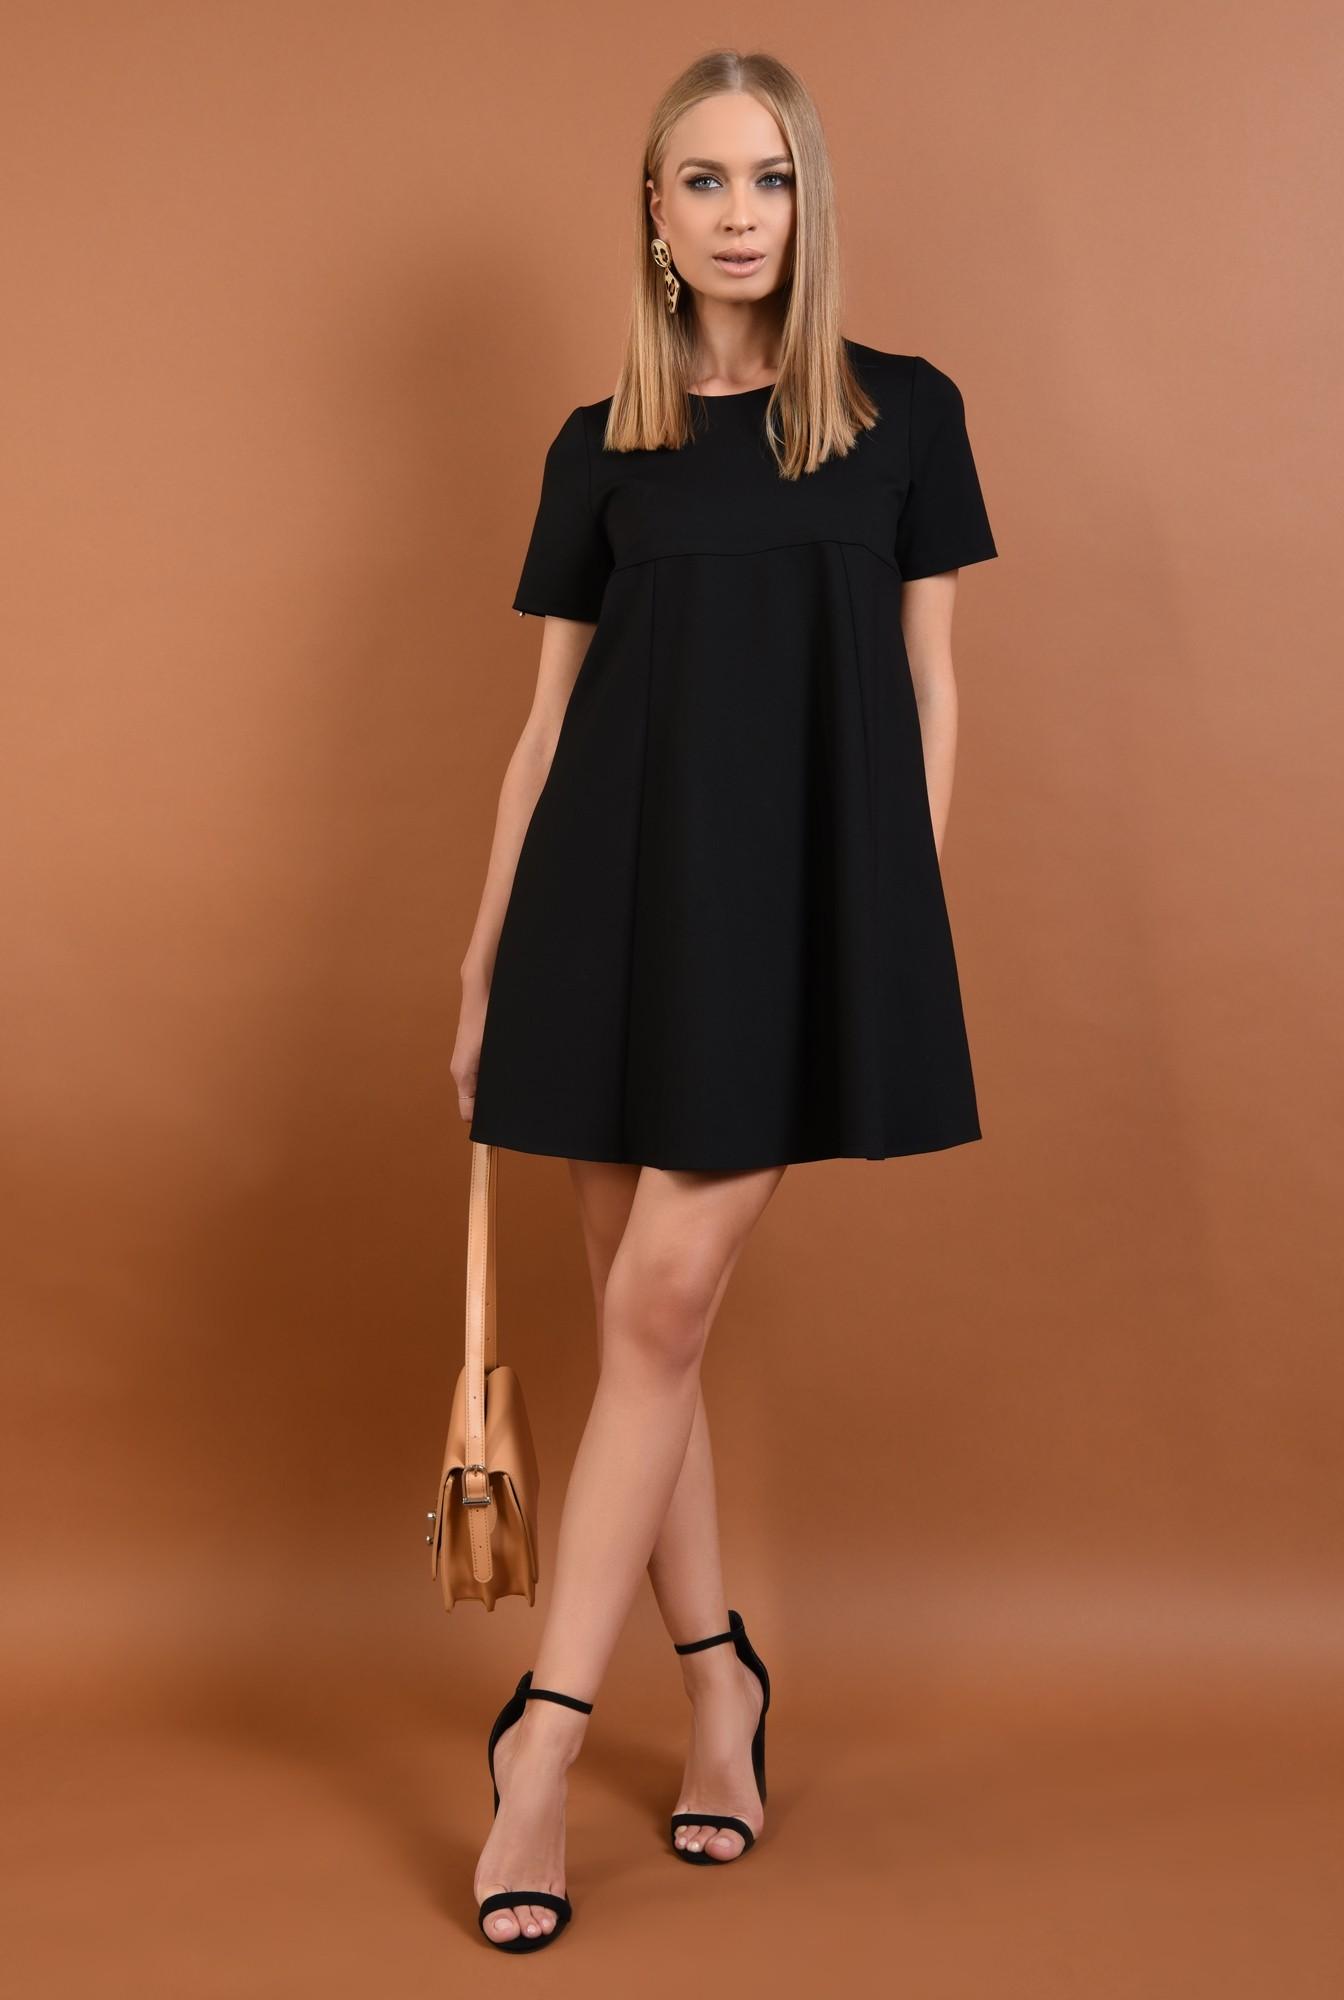 3 - rochie din tricot, neagra, scurta, croi evazat